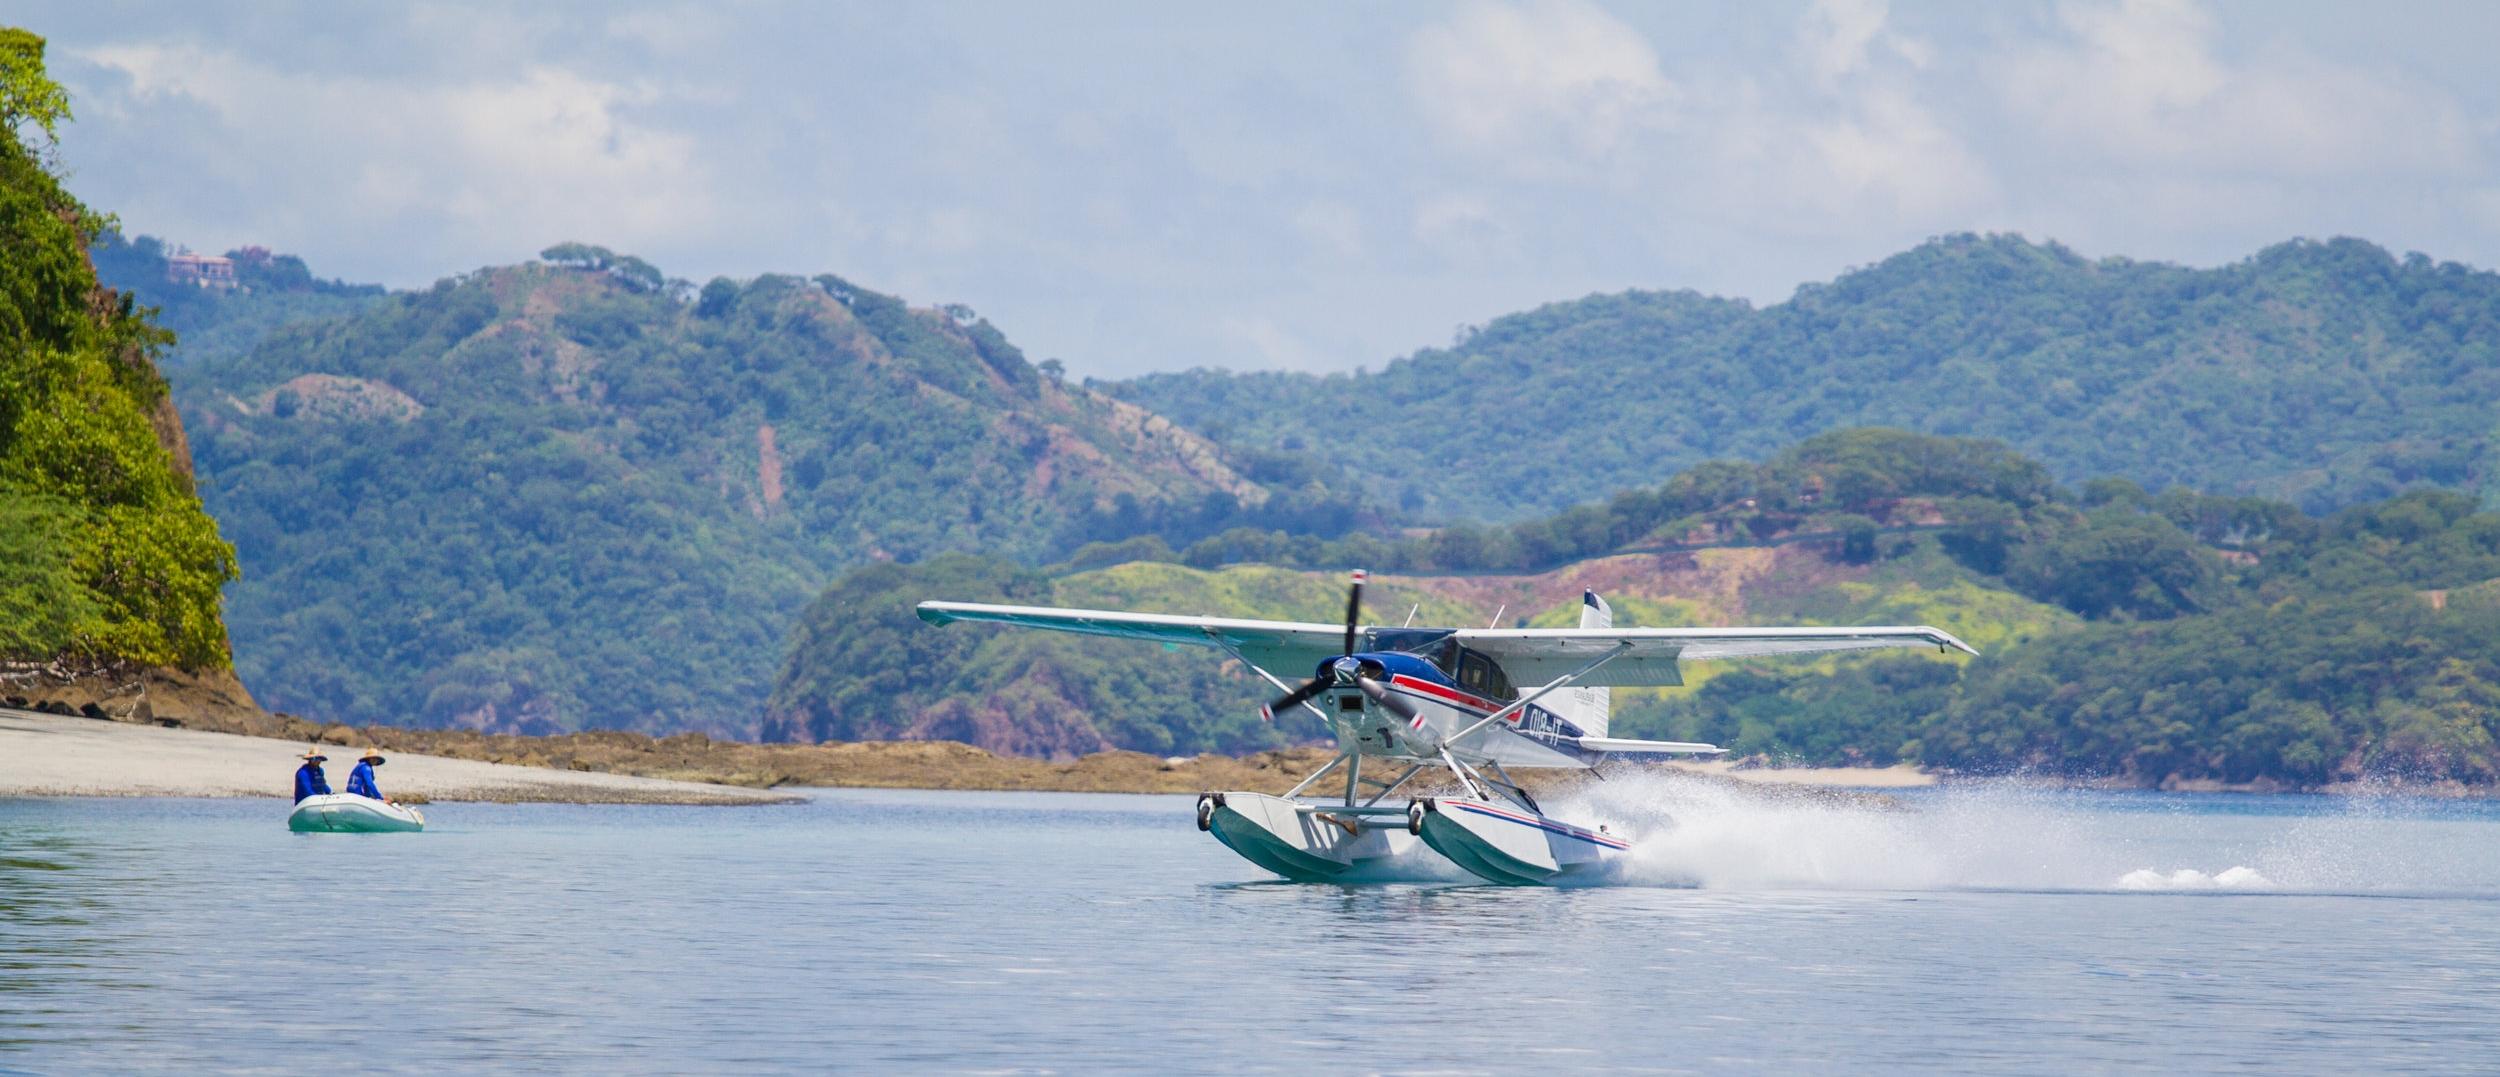 Seaplanes Costa Rica charter flights (1 of 1).jpg